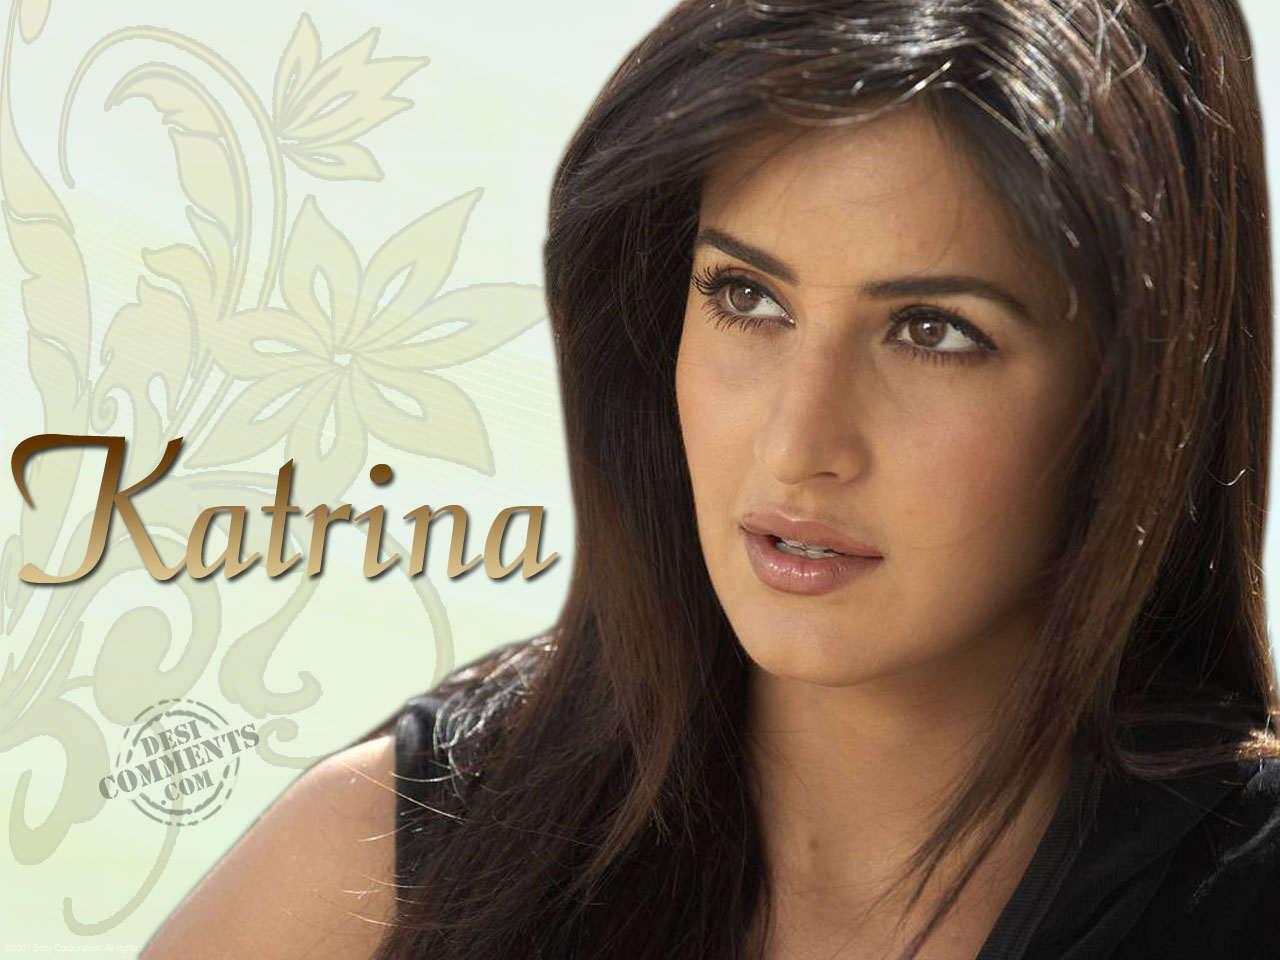 Cute Katrina   DesiCommentscom 1280x960